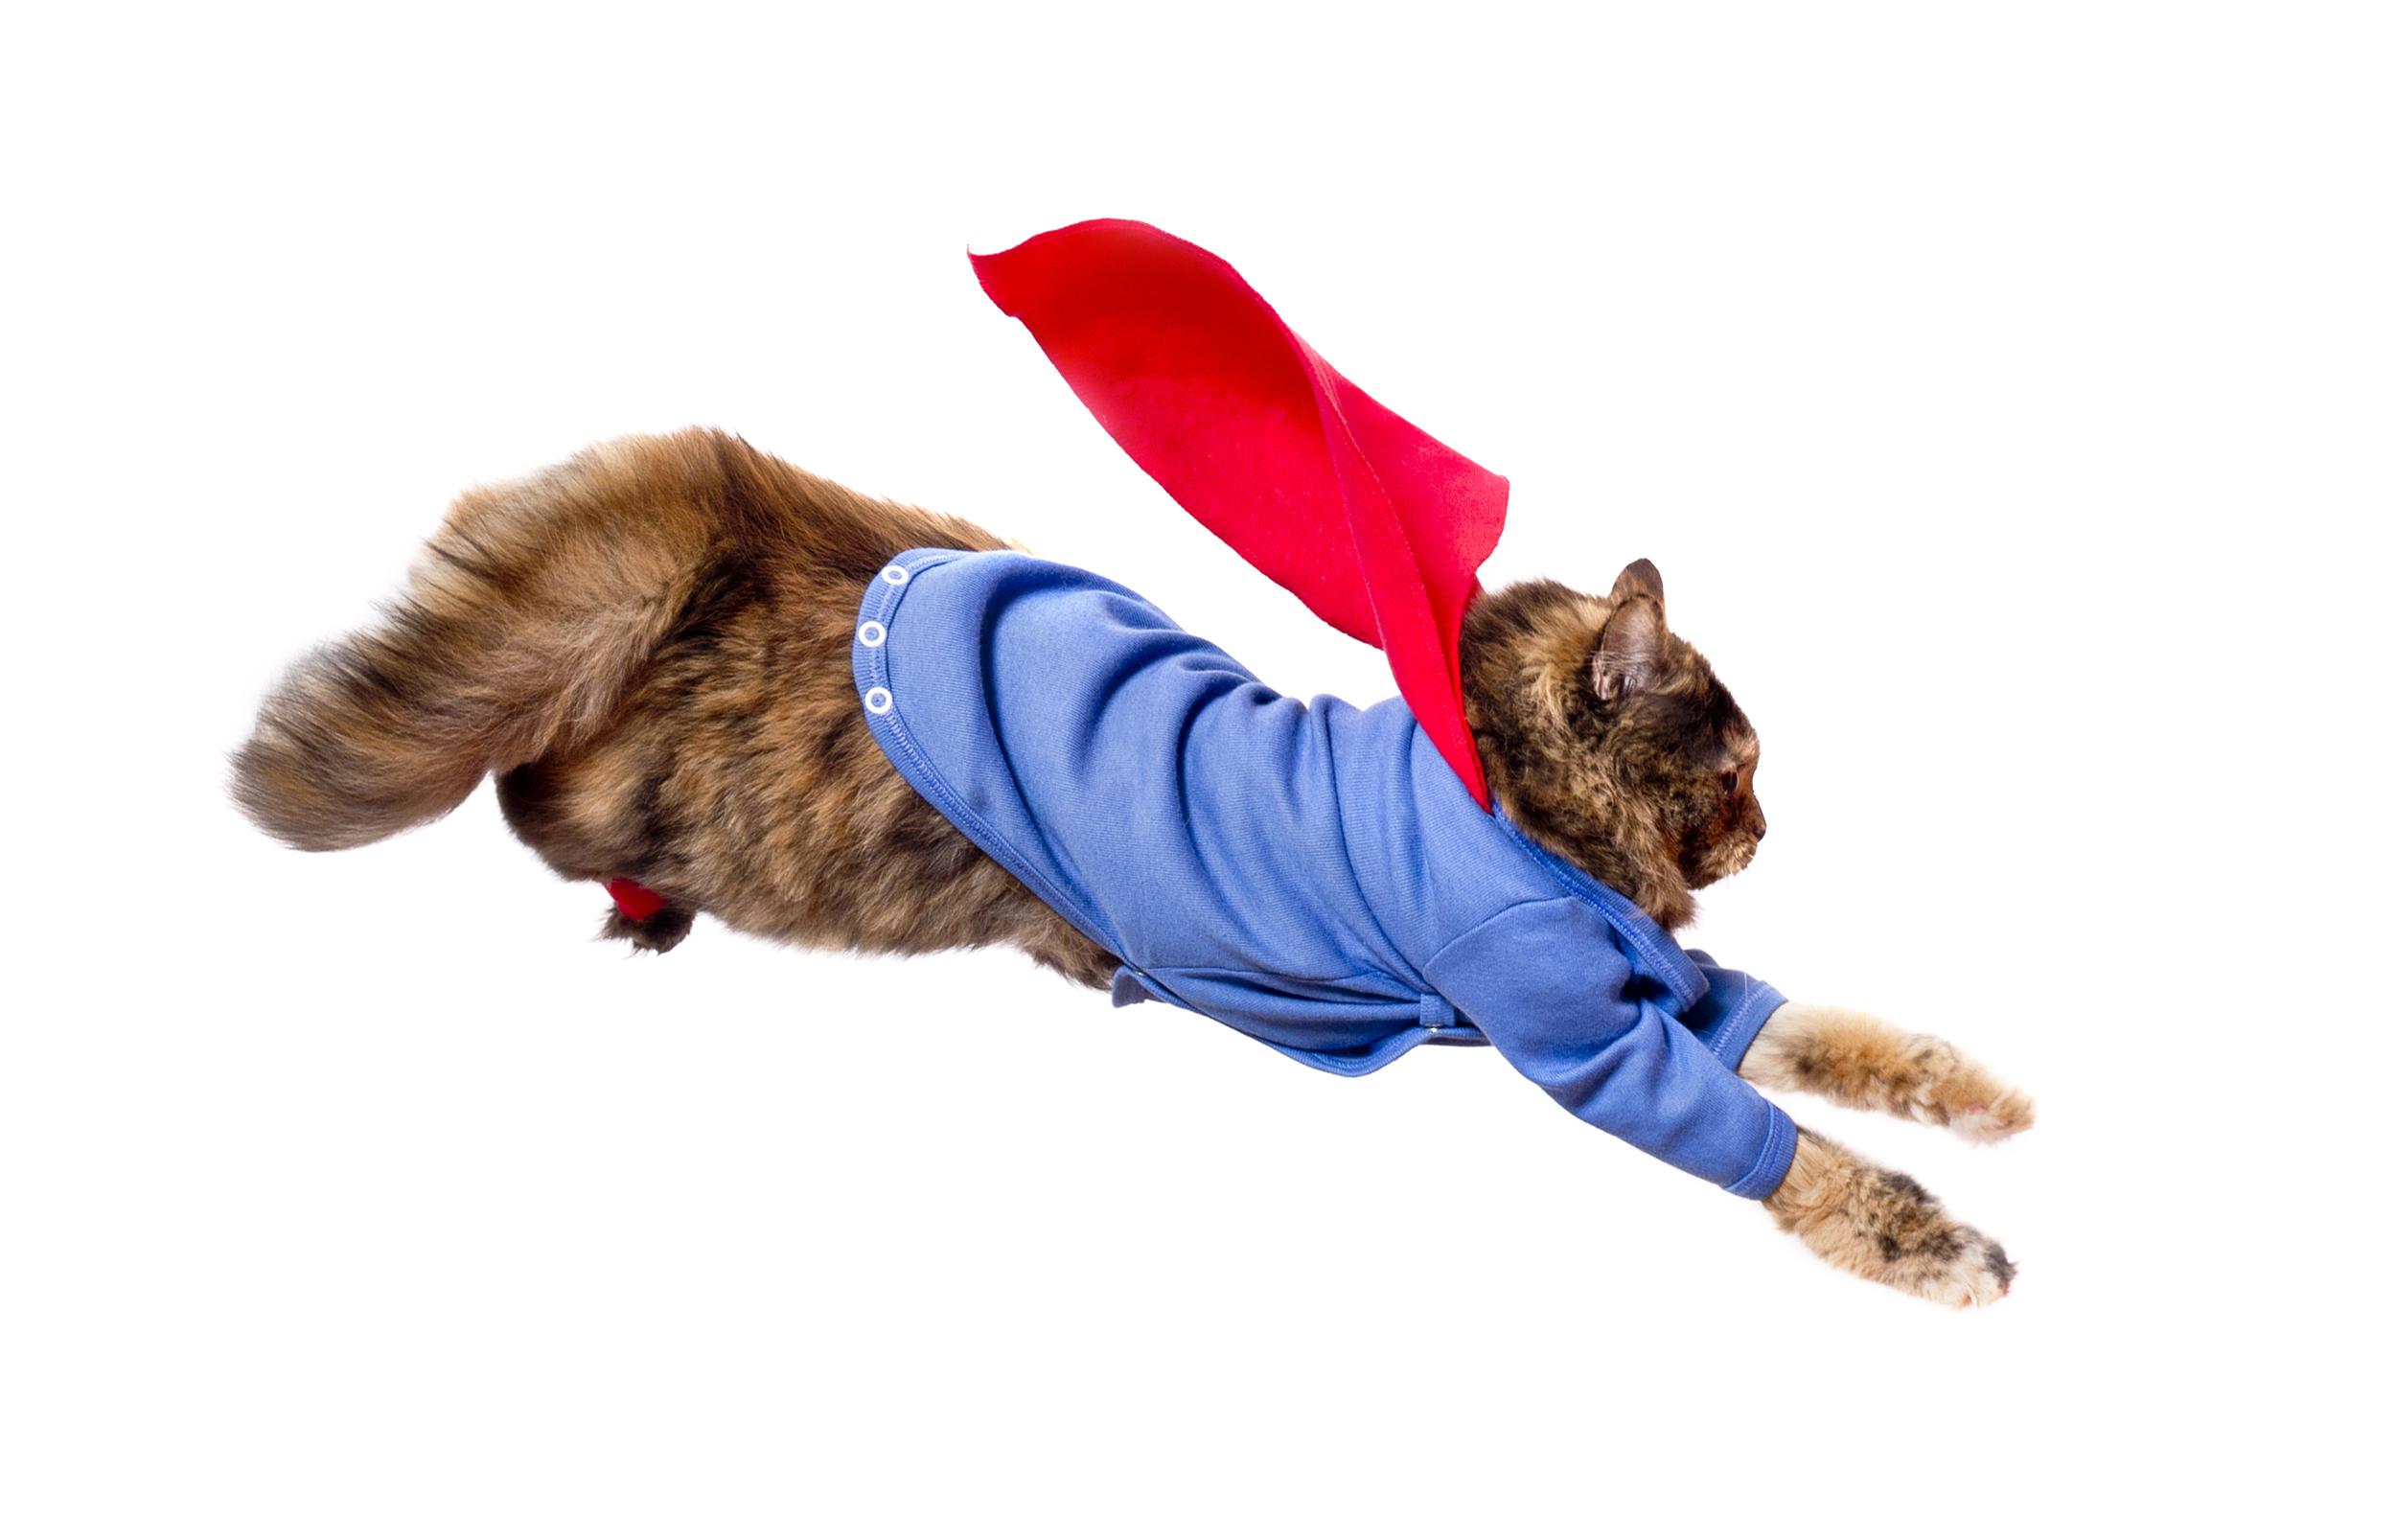 Pet Cat Halloween Costumes 2016 Cute Ideas For Cat Costumes